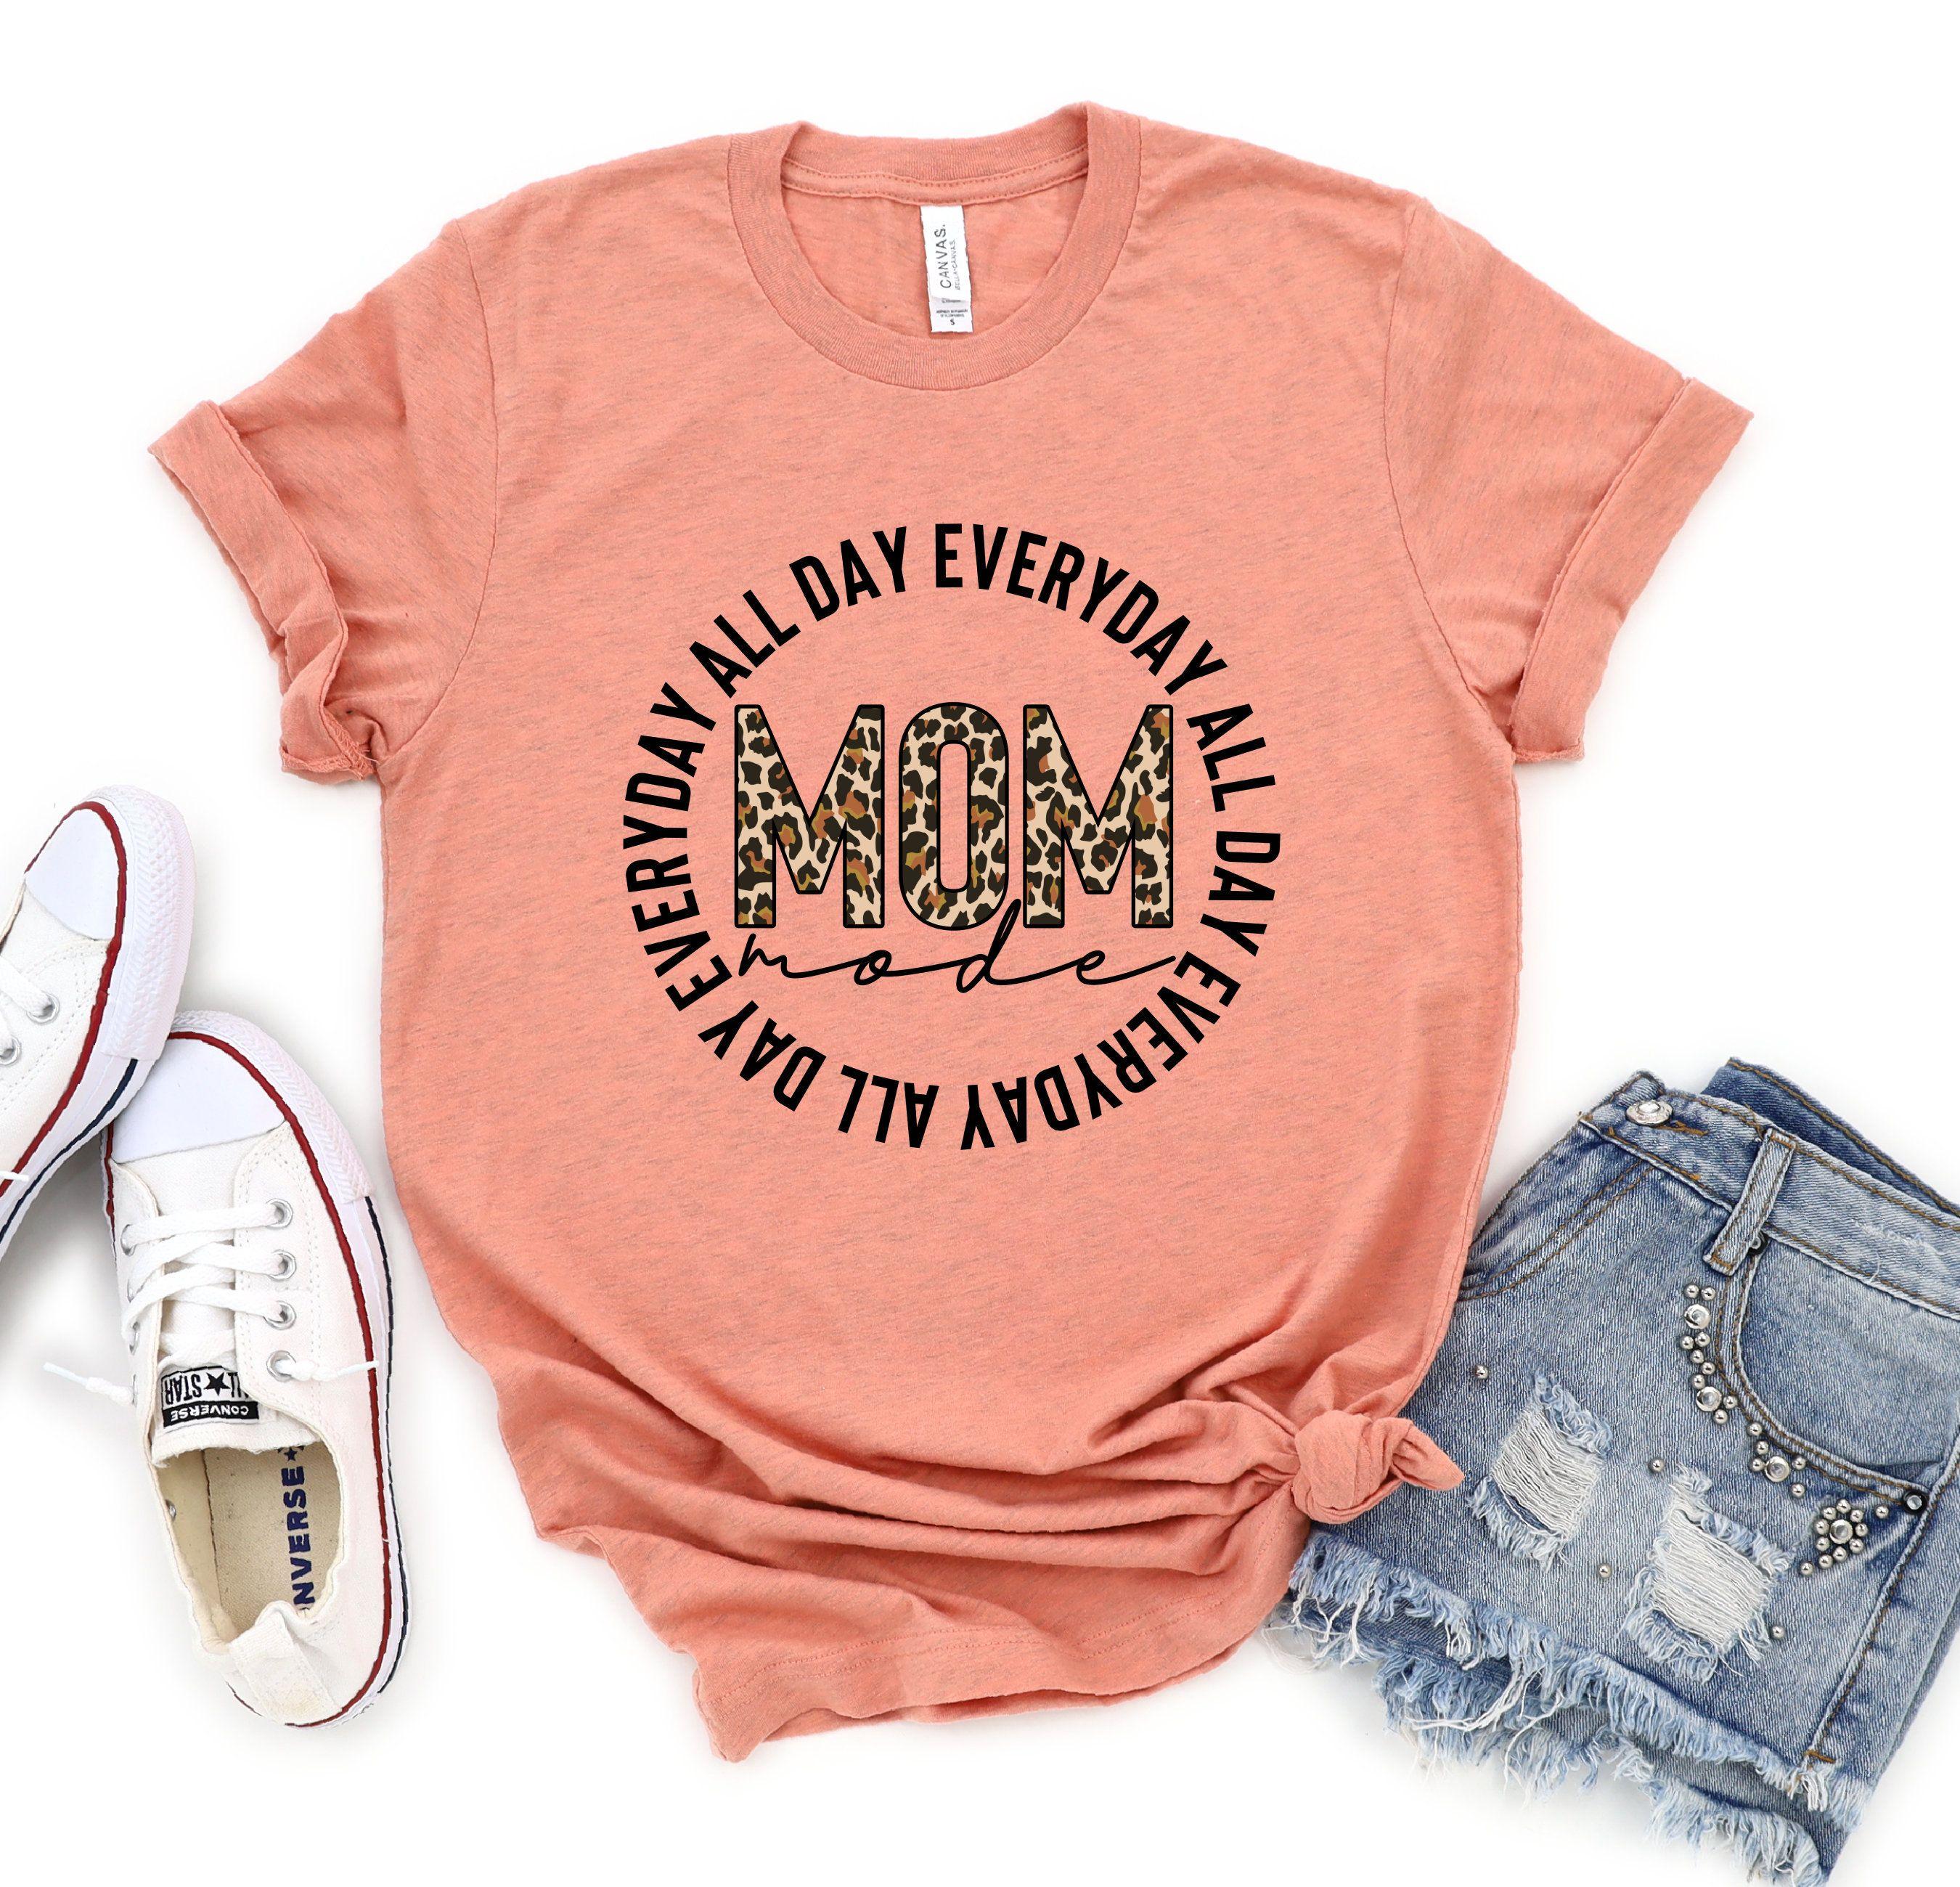 Gift For Mama Cool Mom Tshirt Mom Life Shirt Trendy Mom Shirt Mothers Day T-shirt Mommy Life Shirt Mom to be Tshirt New Mom T-shirt